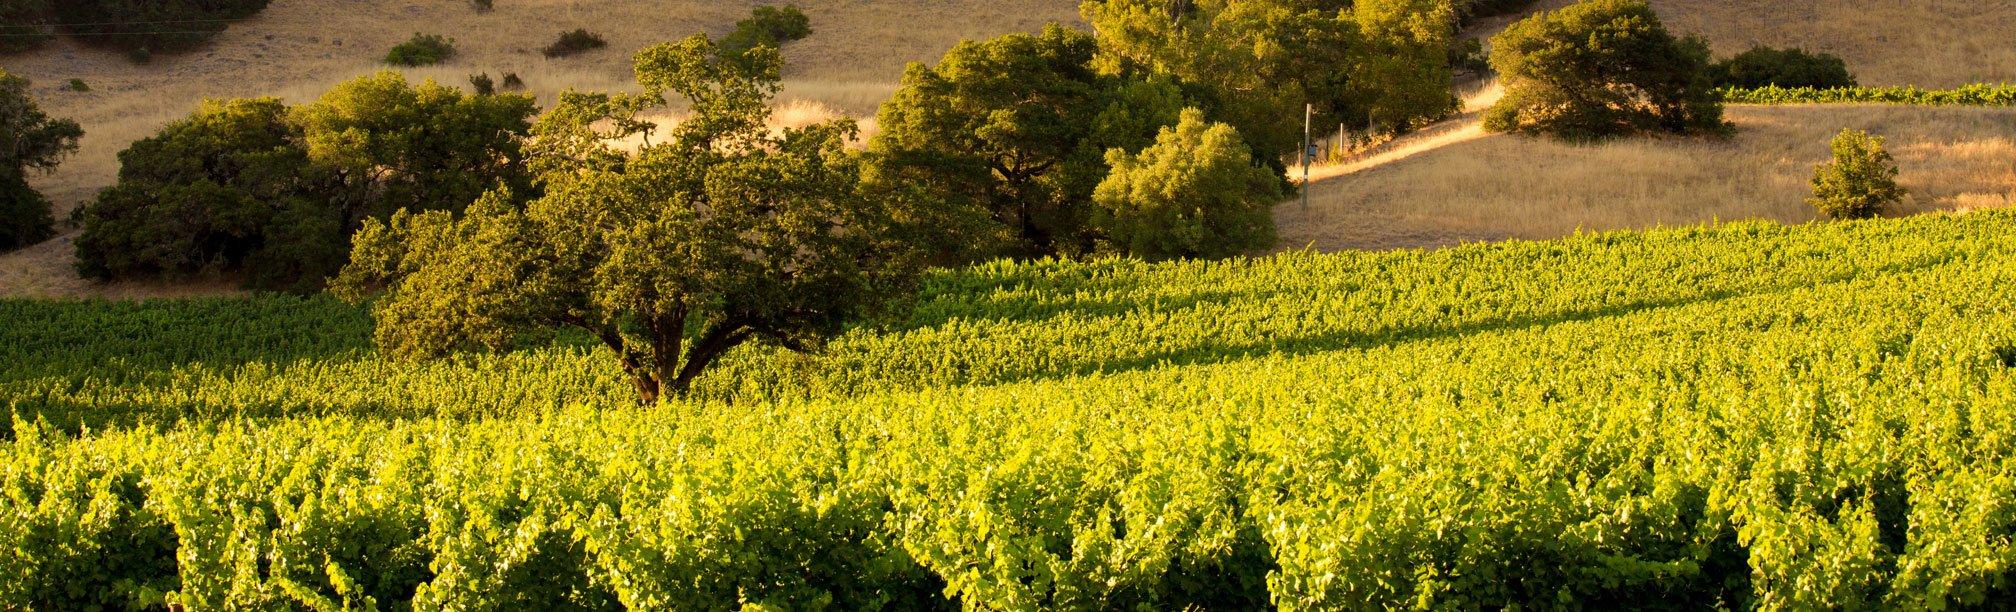 Hillside and Vineyards